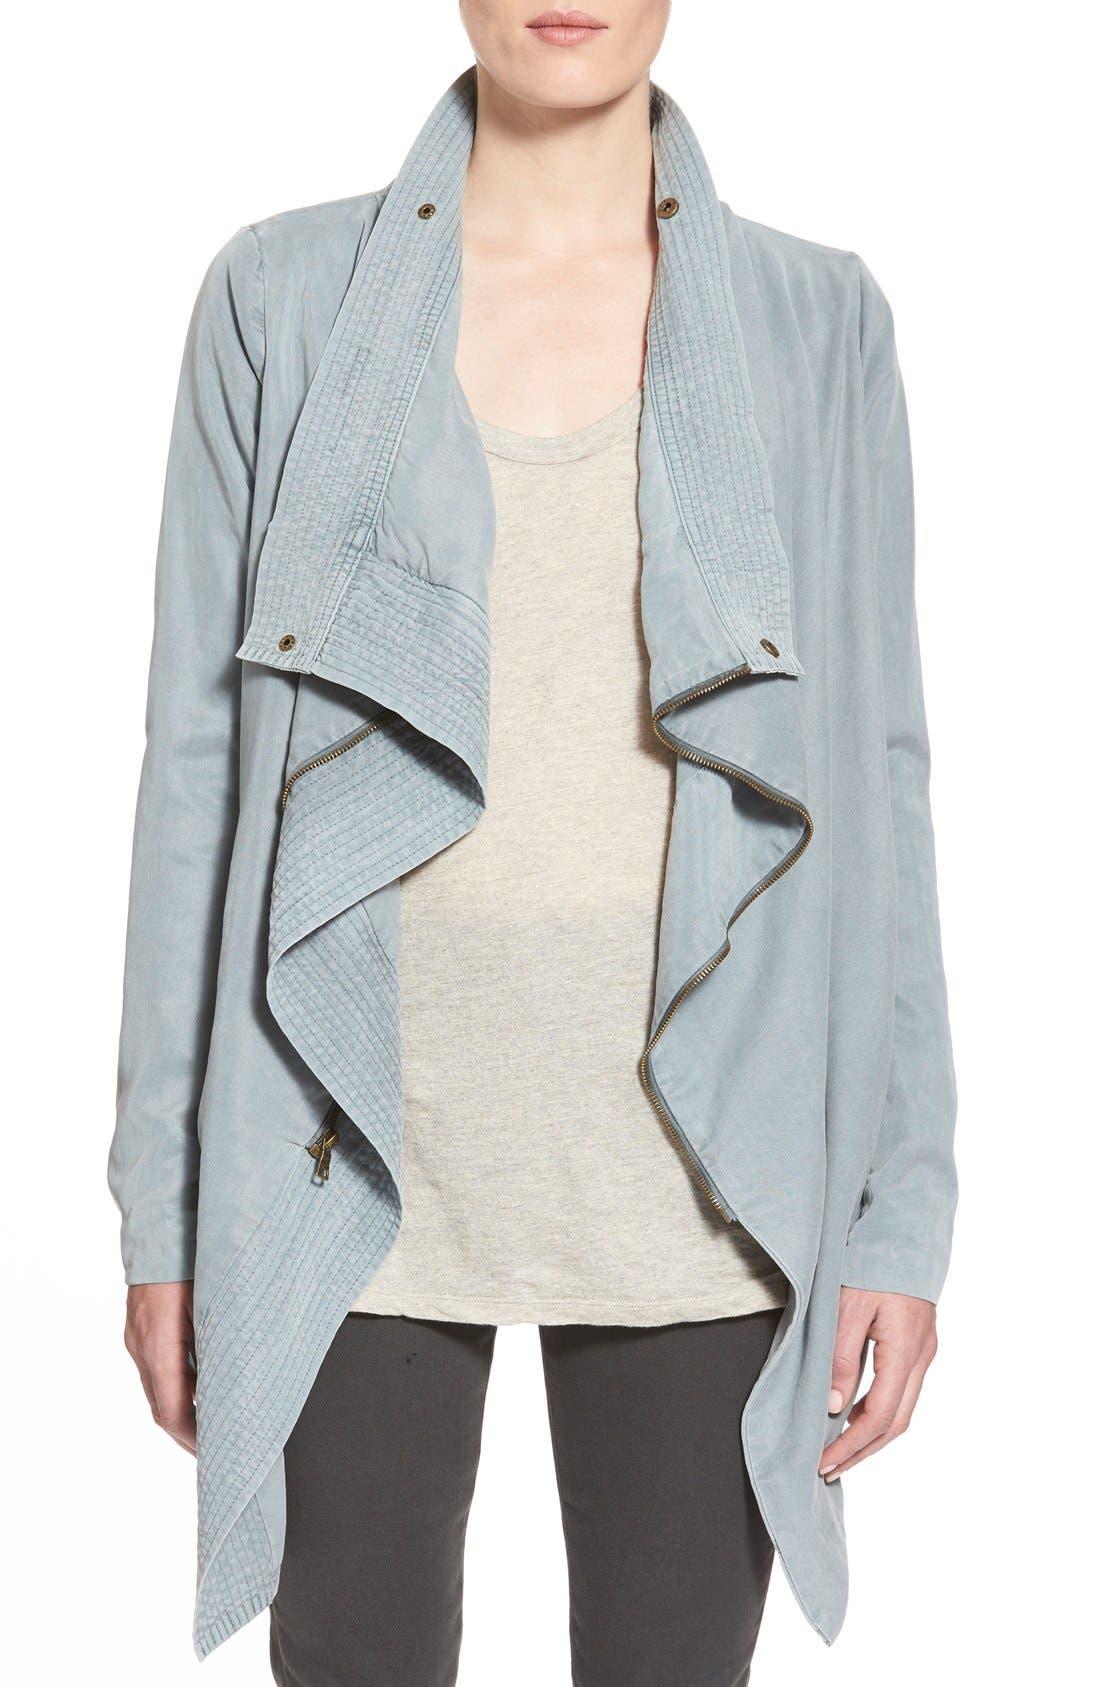 Alternate Image 1 Selected - Young Fabulous & Broke 'Lida' Jacket